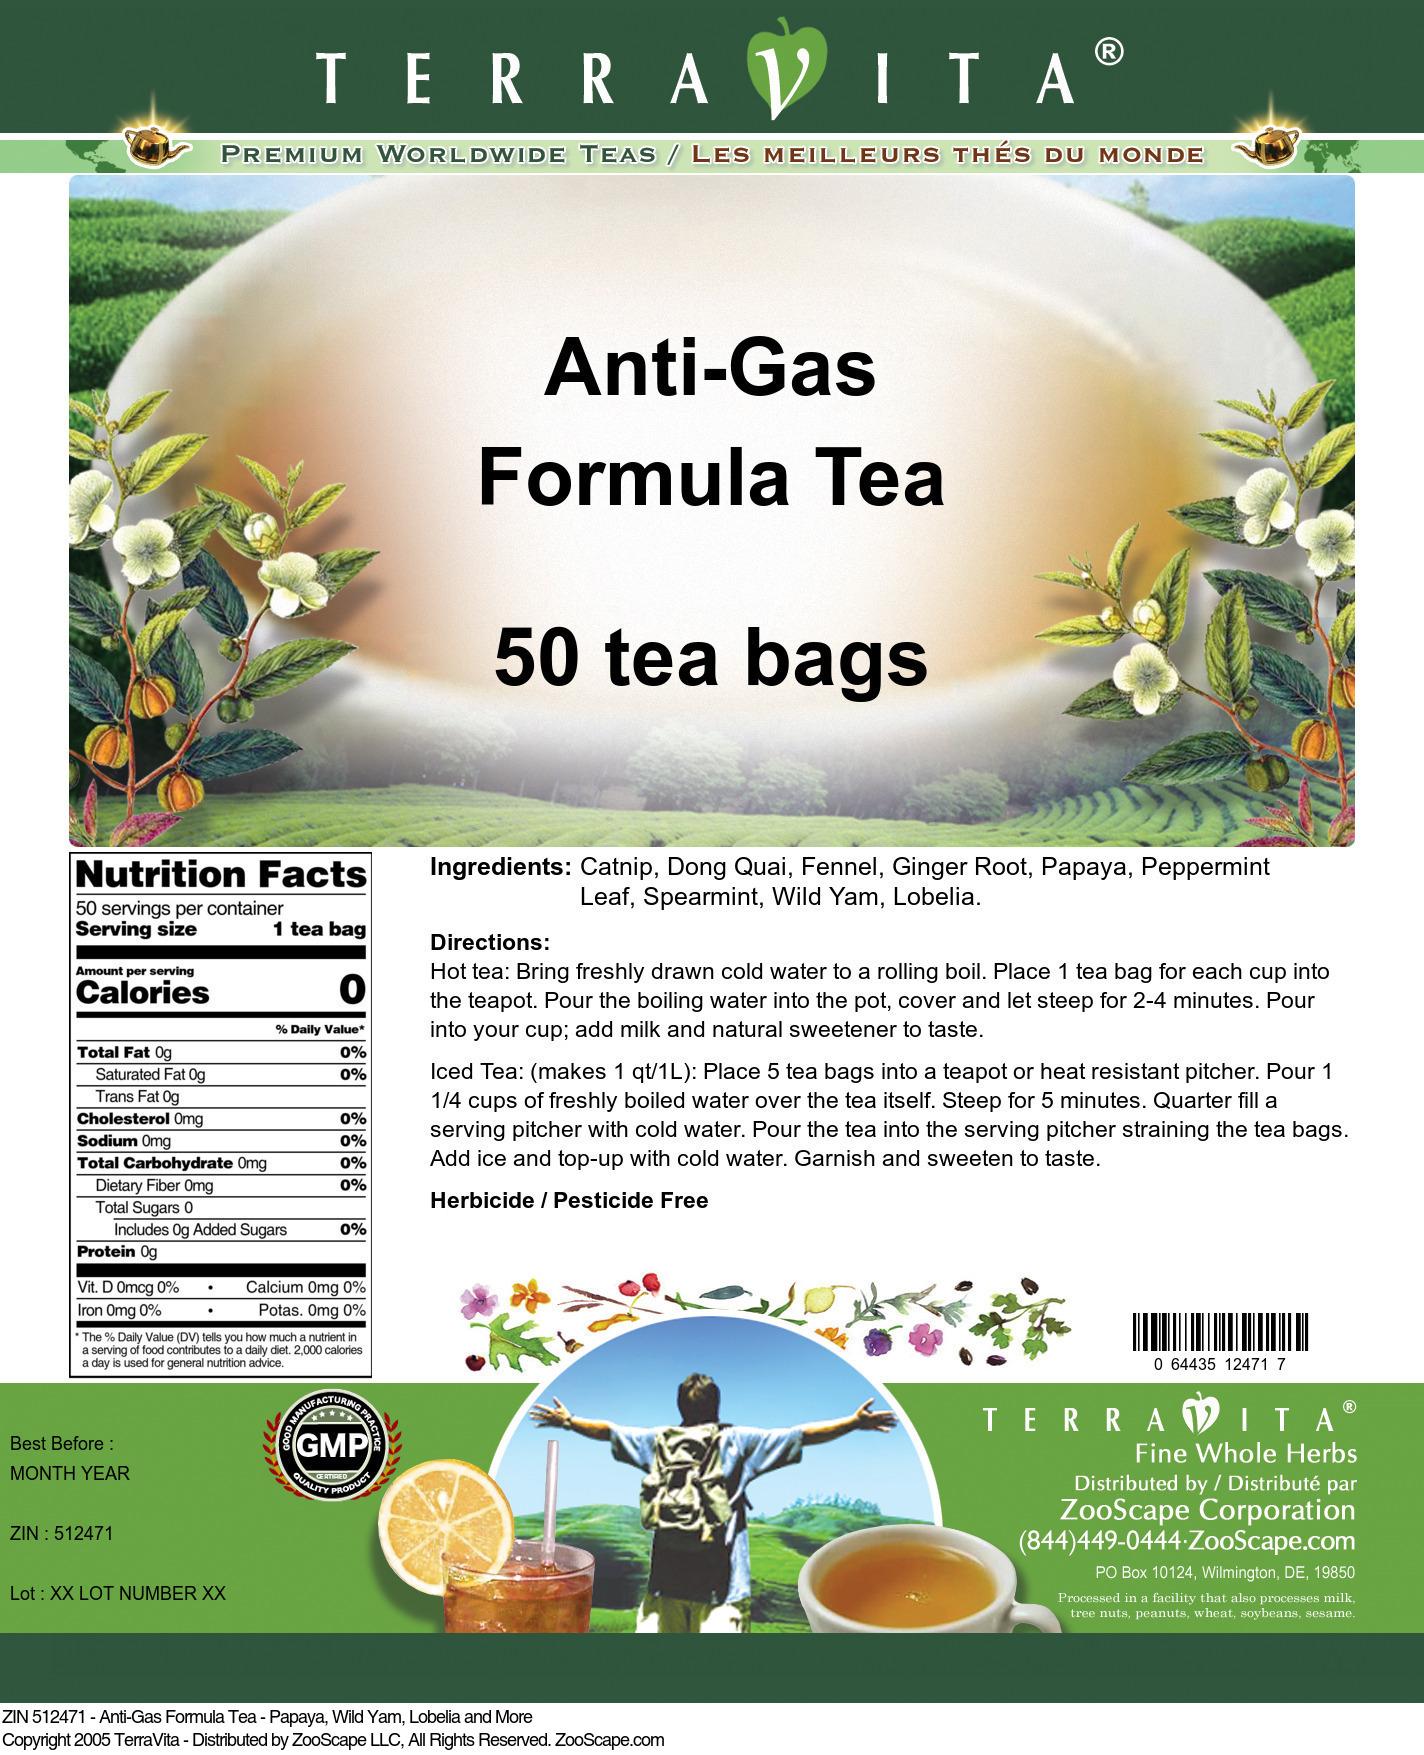 Anti-Gas Formula Tea - Papaya, Wild Yam, Lobelia and More